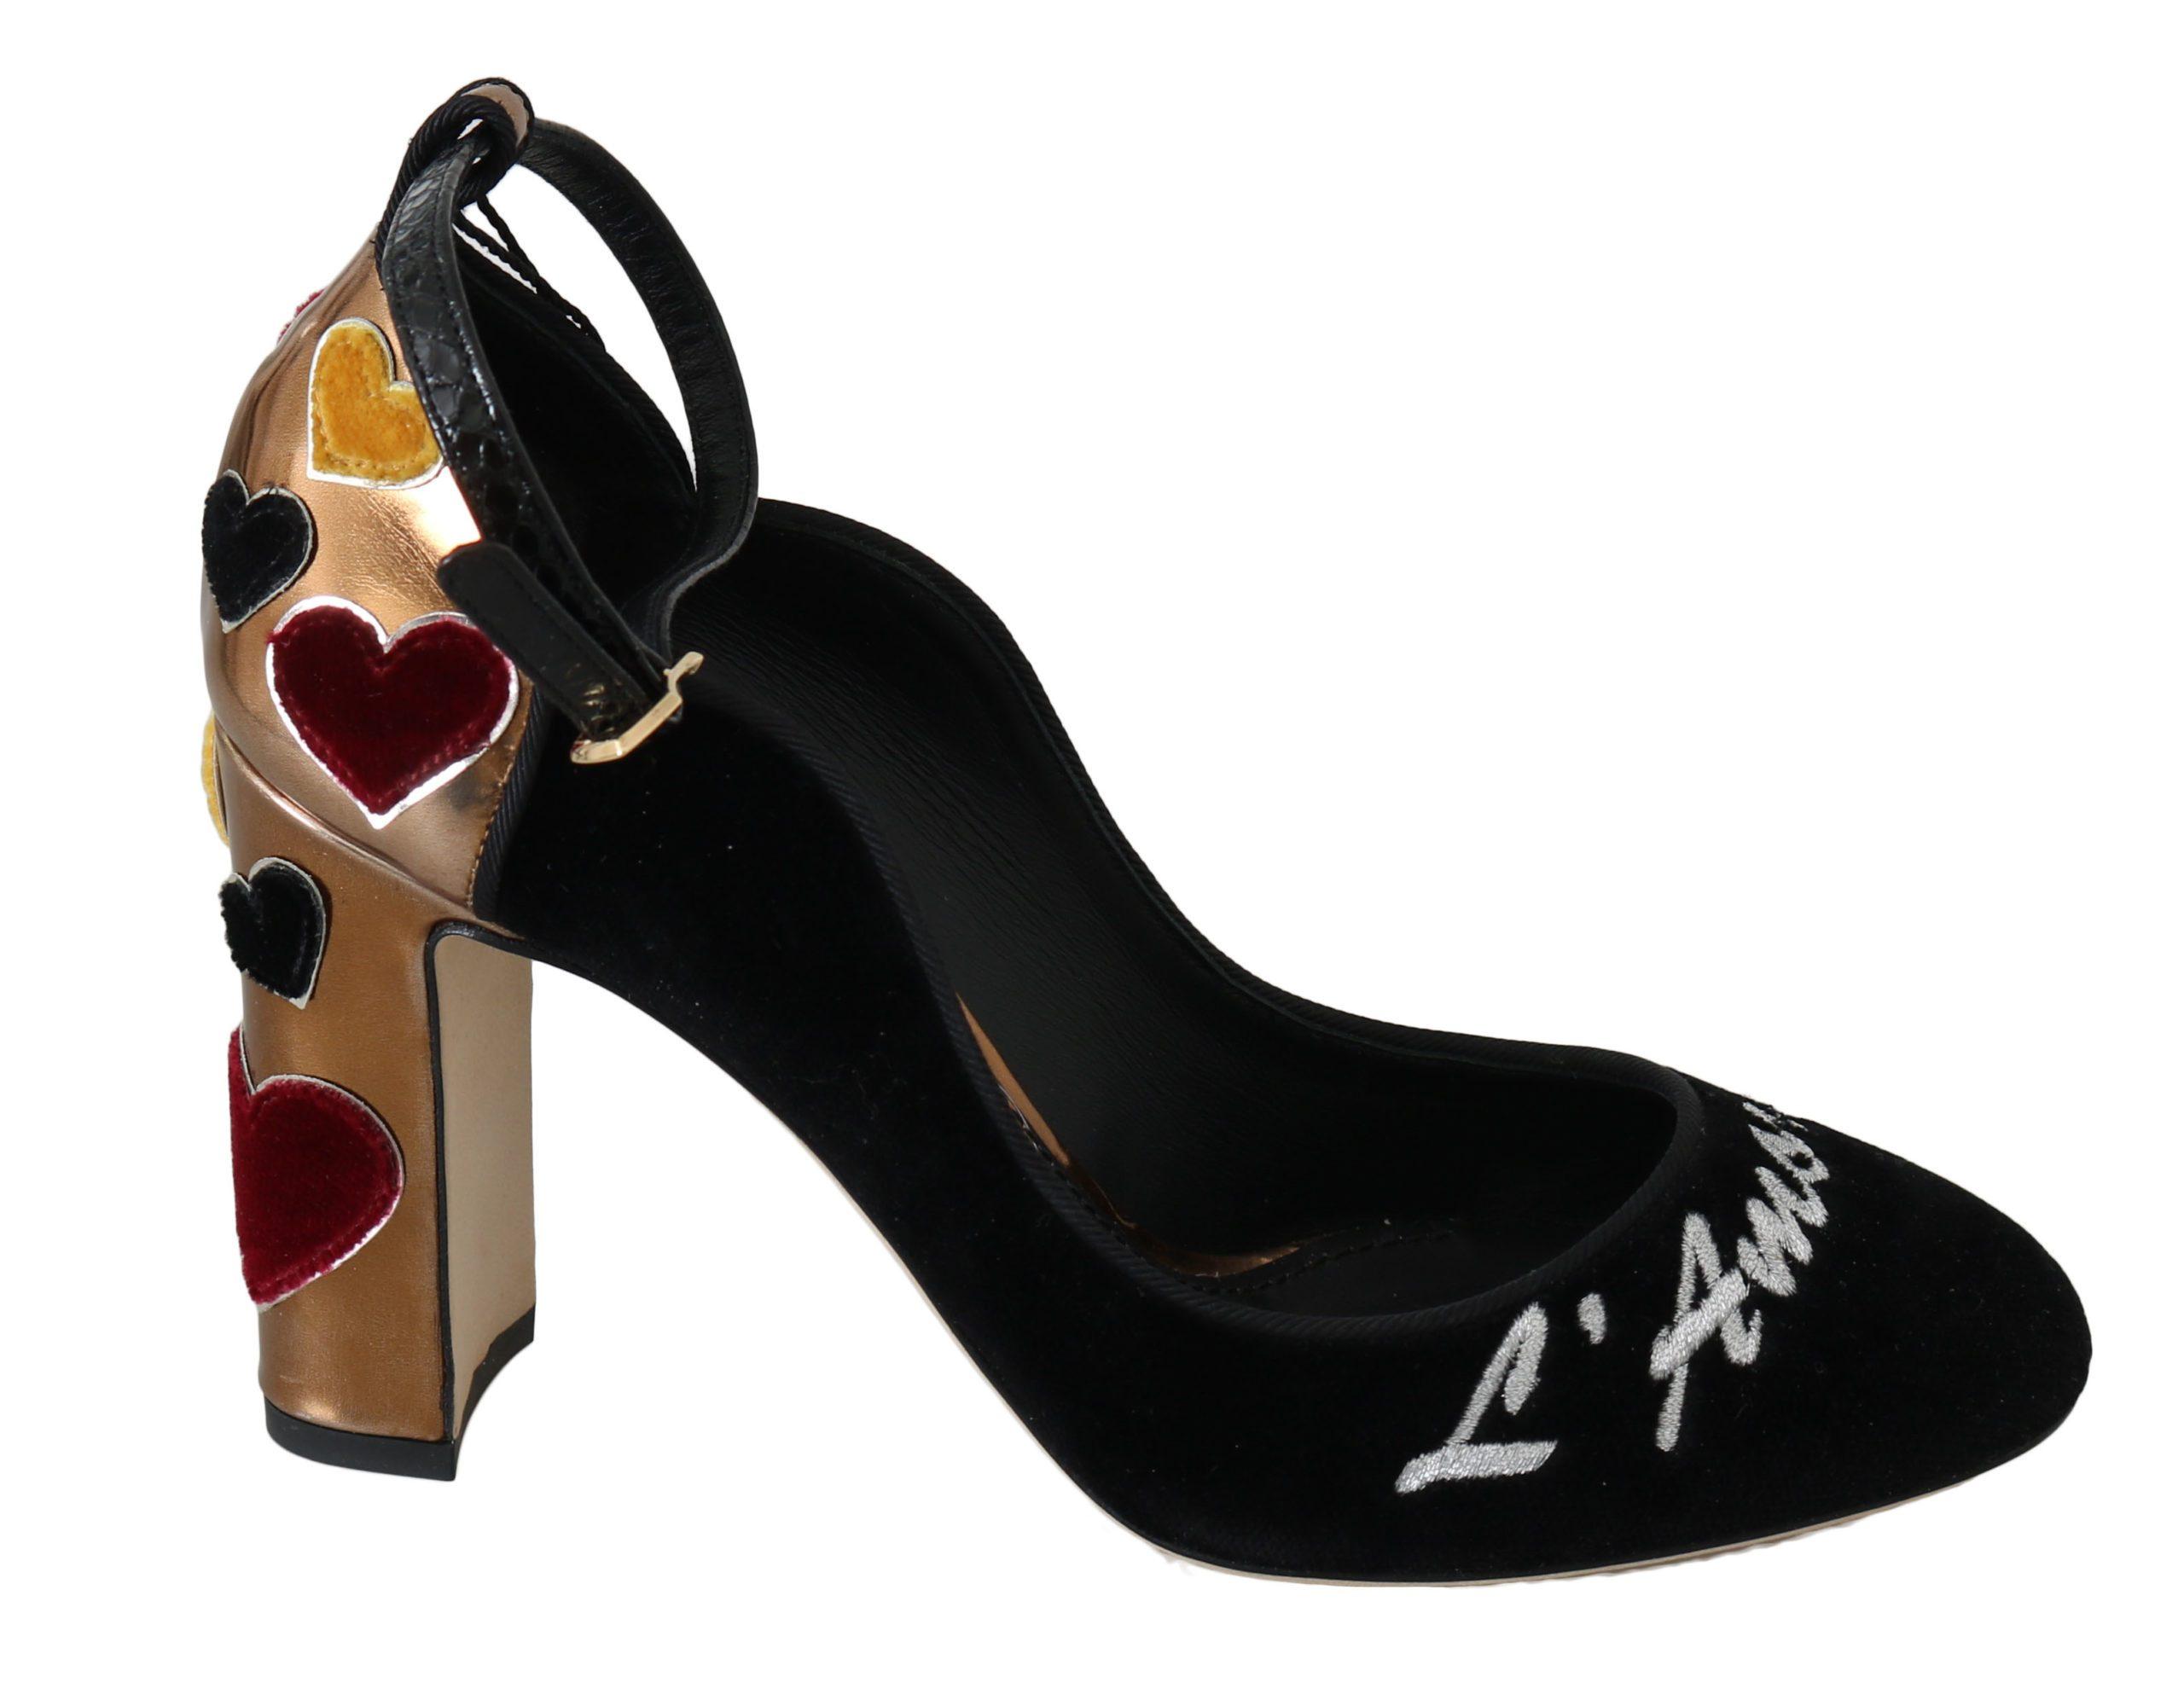 Dolce & Gabbana Women's Leather Hearts Heels Multicolor LA6253 - EU35/US4.5